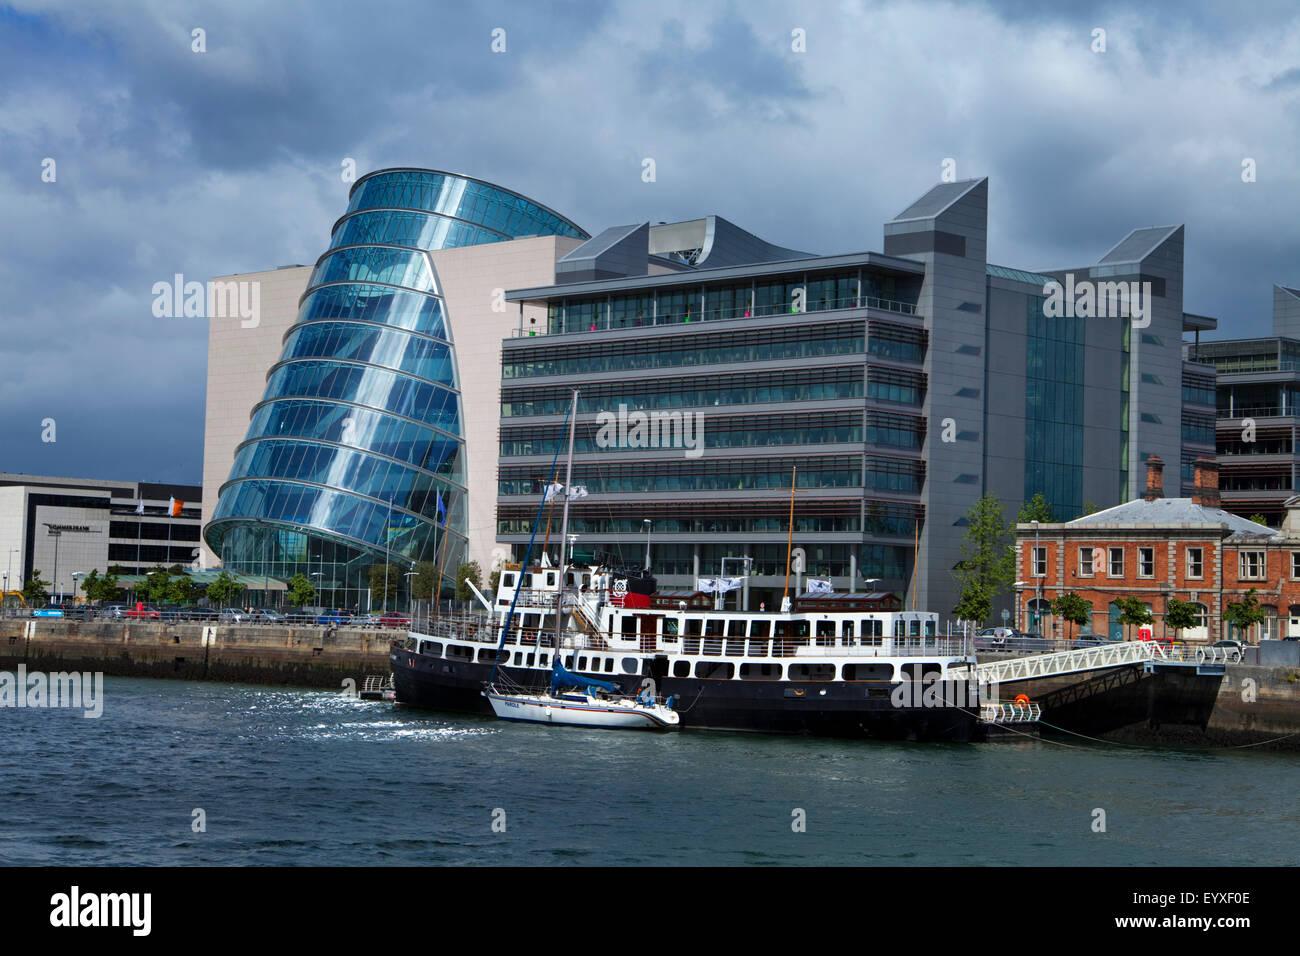 MV Cill Airne (River Restaurant, The National Irish Conference Centre, Dublin City, Ireland - Stock Image